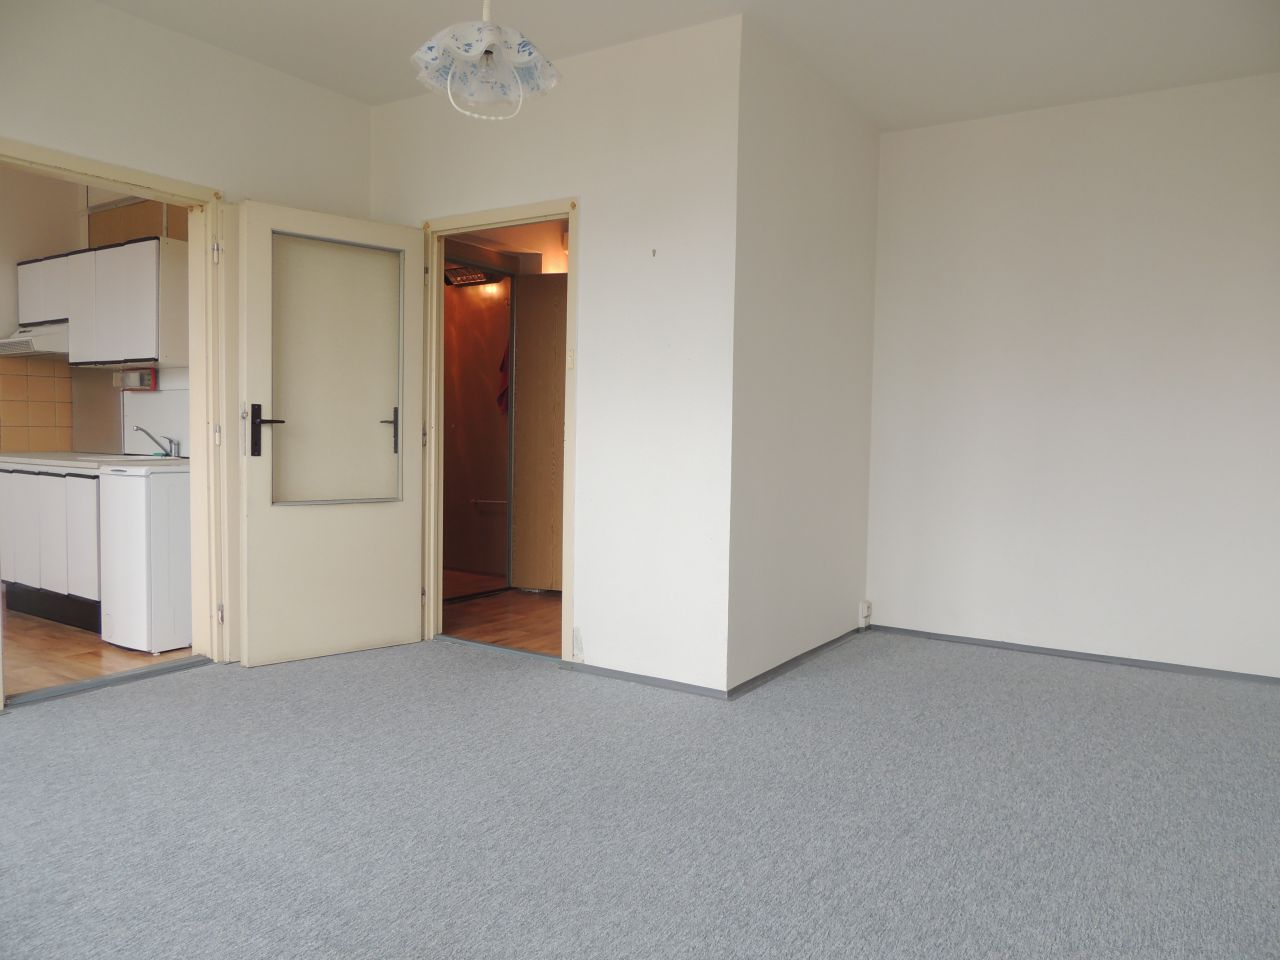 Pronájem bytu 1+1 35 m2, ul. Aloise Gavlase 34/6, Ostrava - Dubina